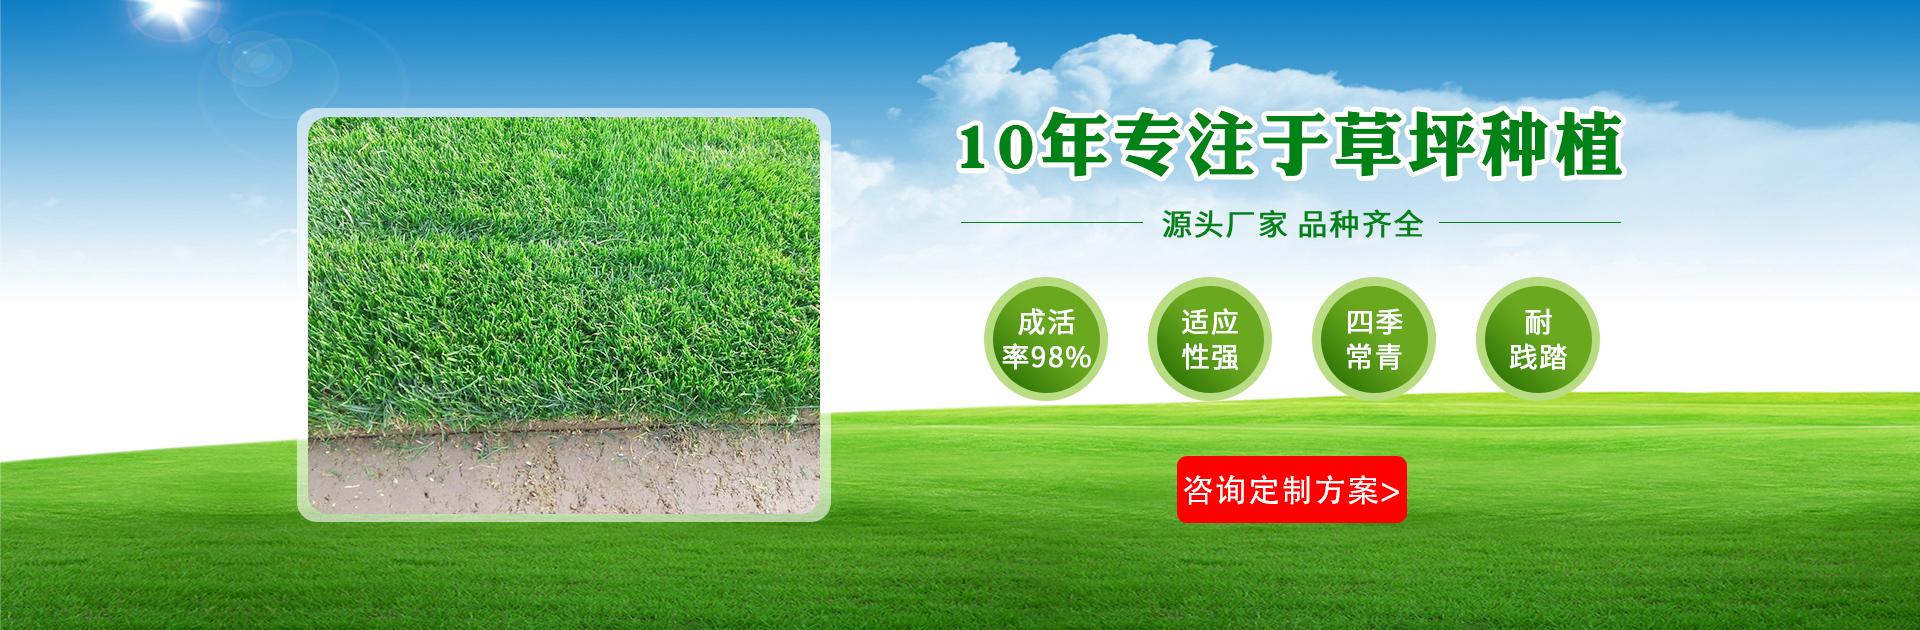 重庆真草坪